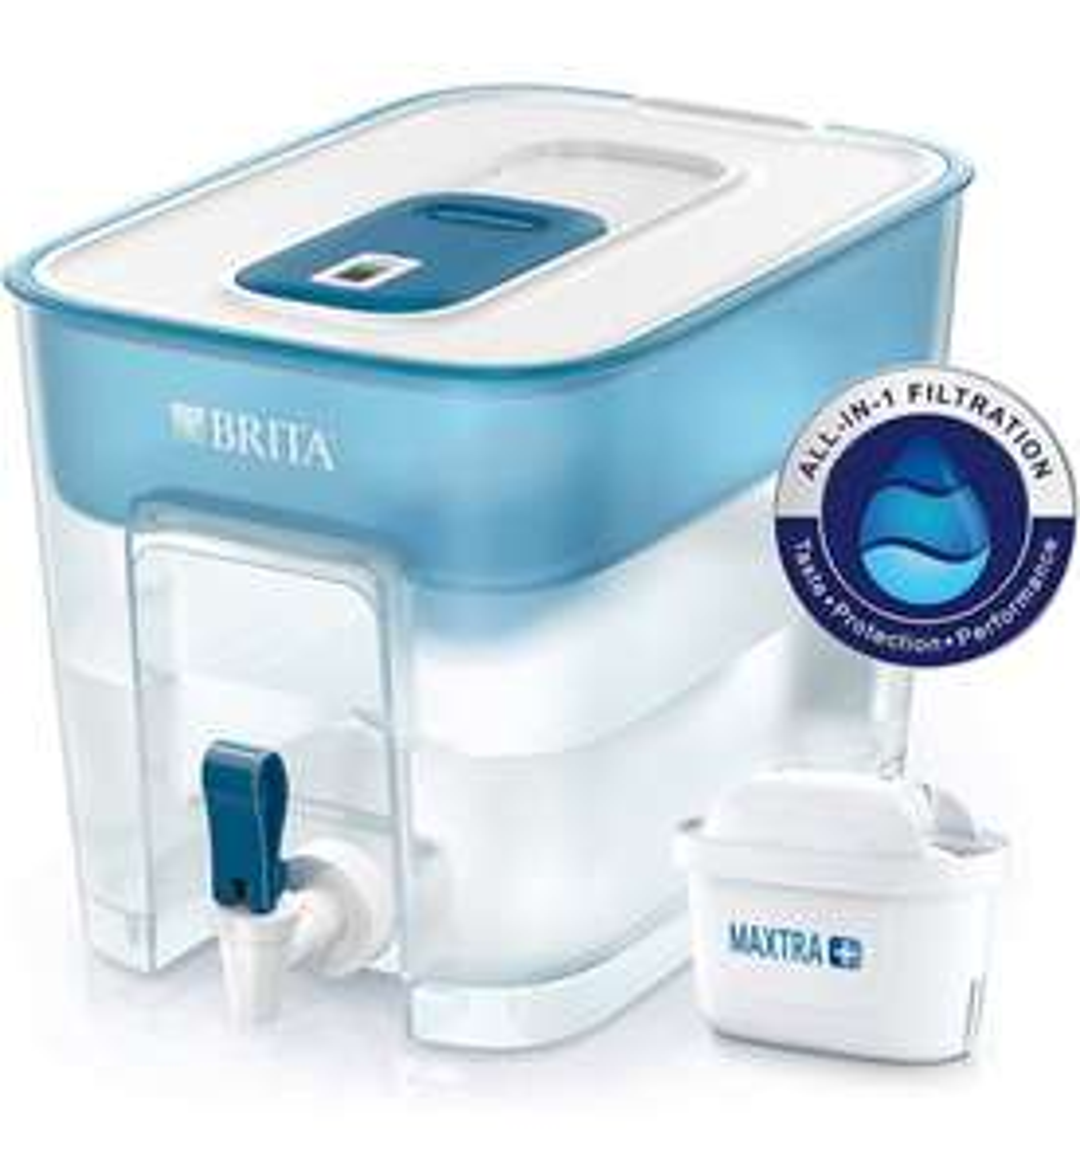 Brita Flow XXL Fridge Water Filter Tank £27.99 Amazon